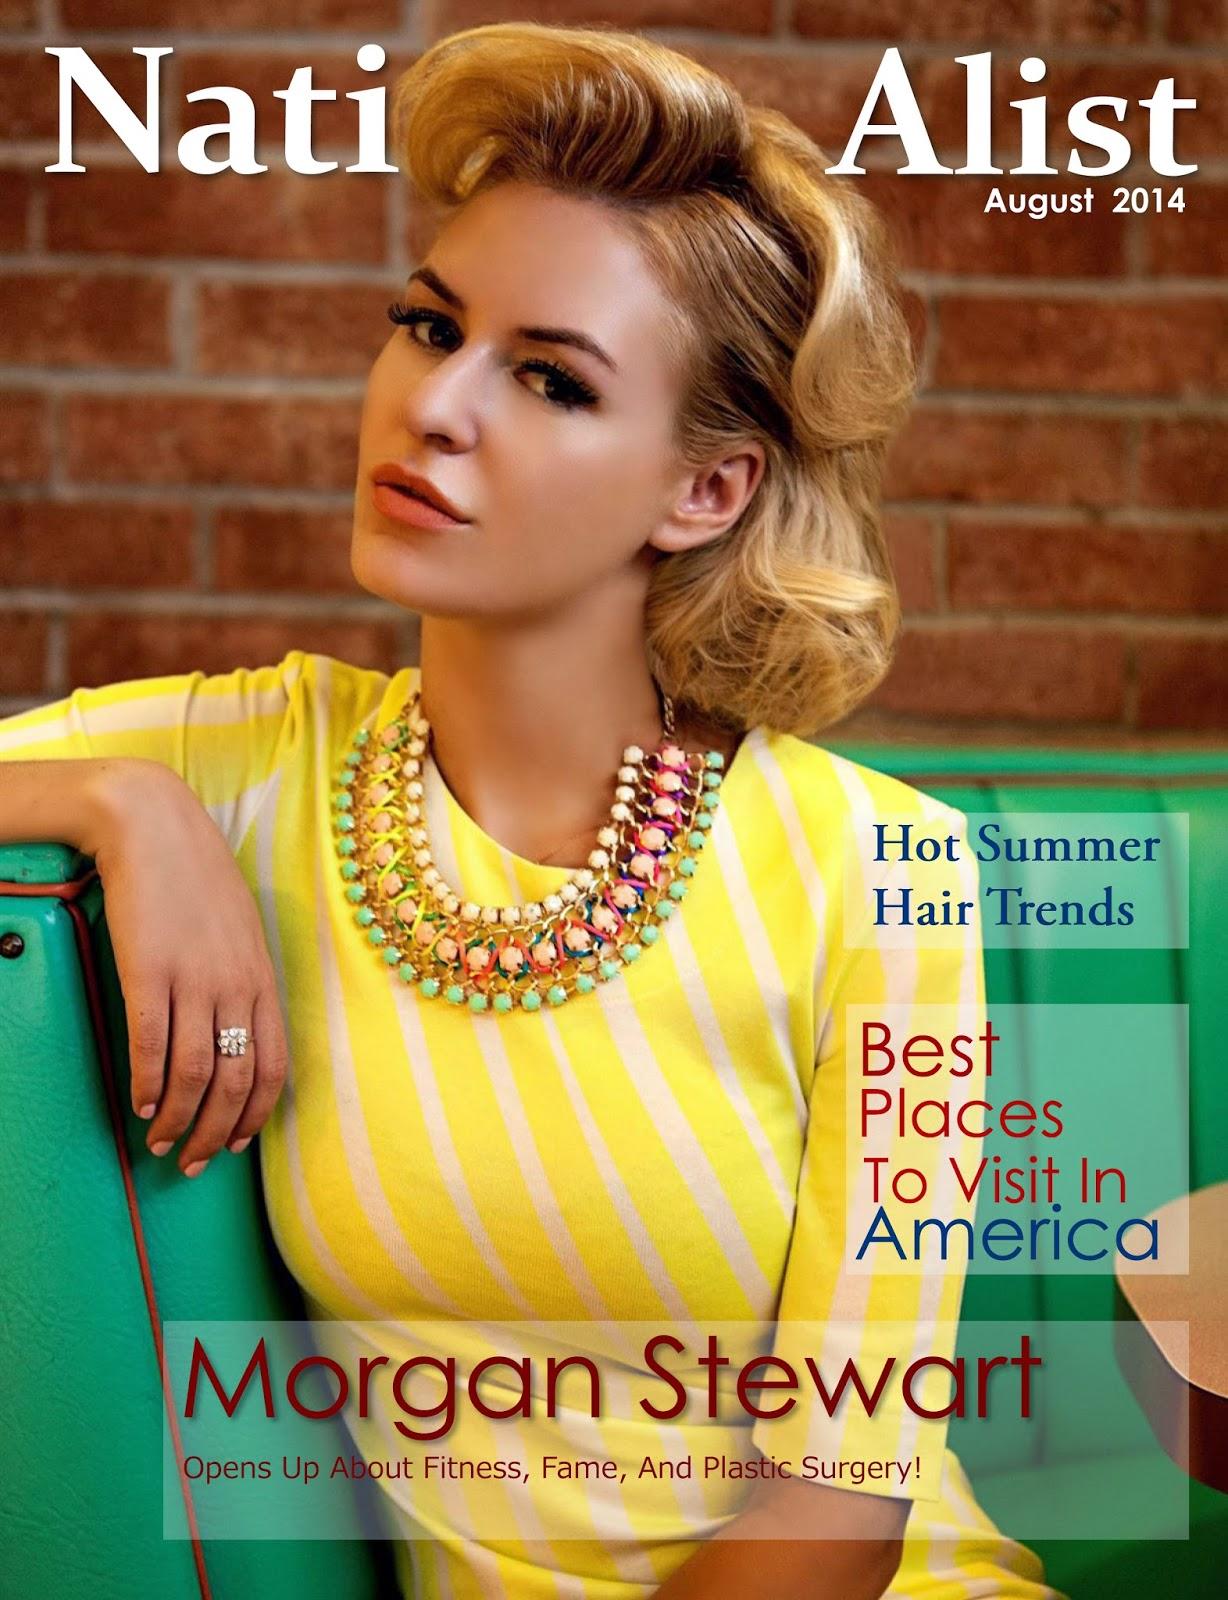 Morgan Stewart by PhotoShoot for Nationalist Magazine, August 2014